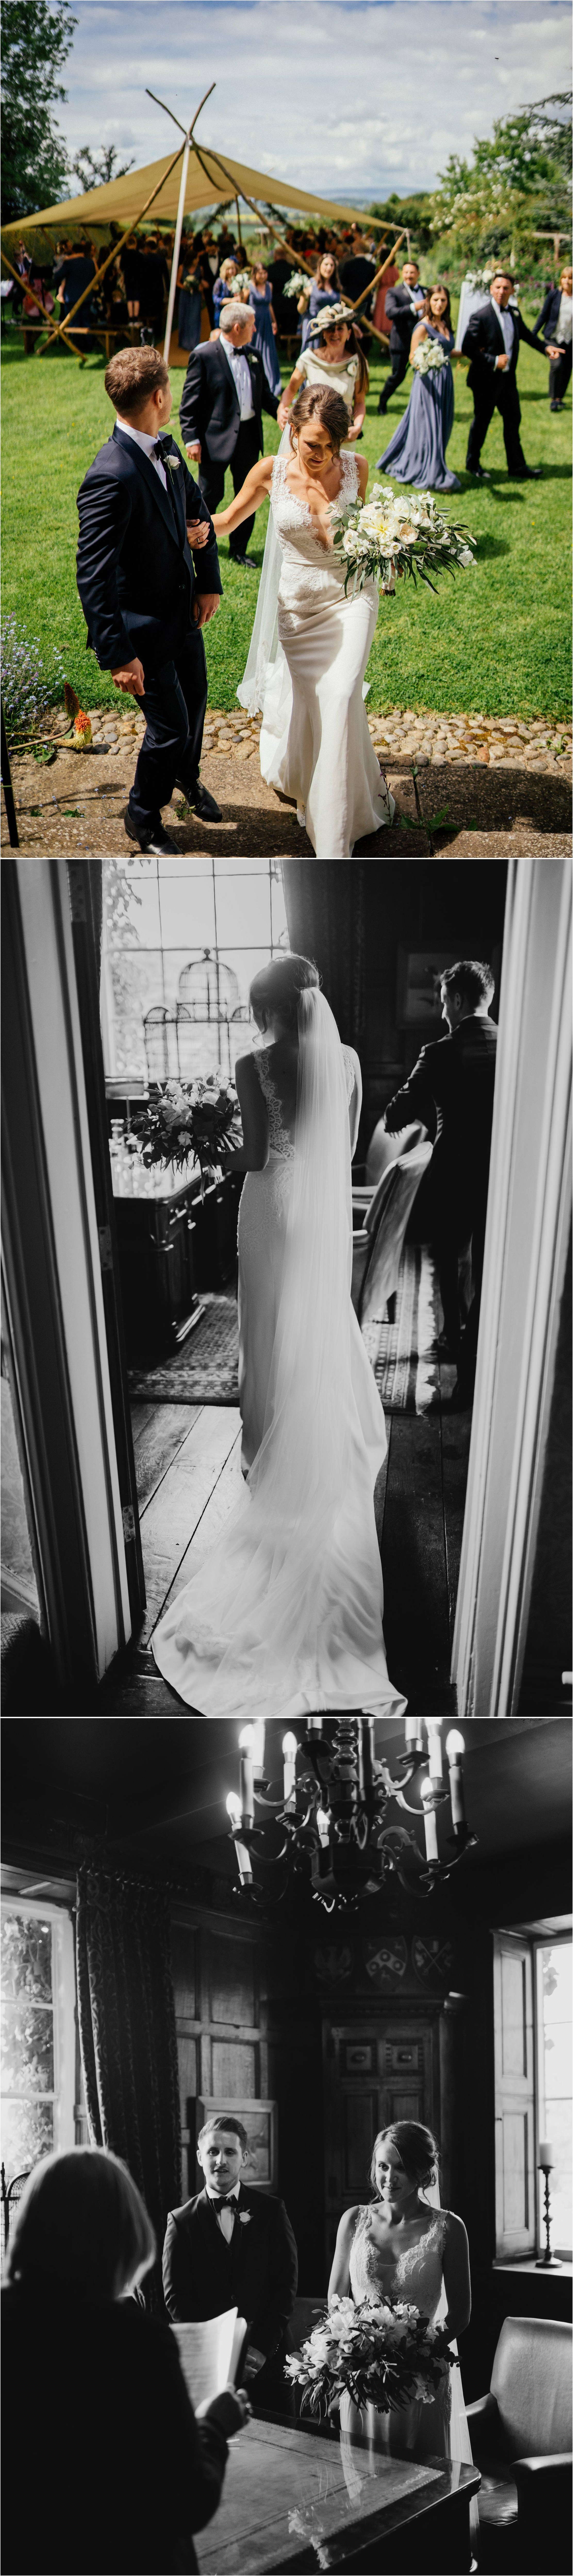 Dewsall Court Herefordshire wedding photographer_0172.jpg